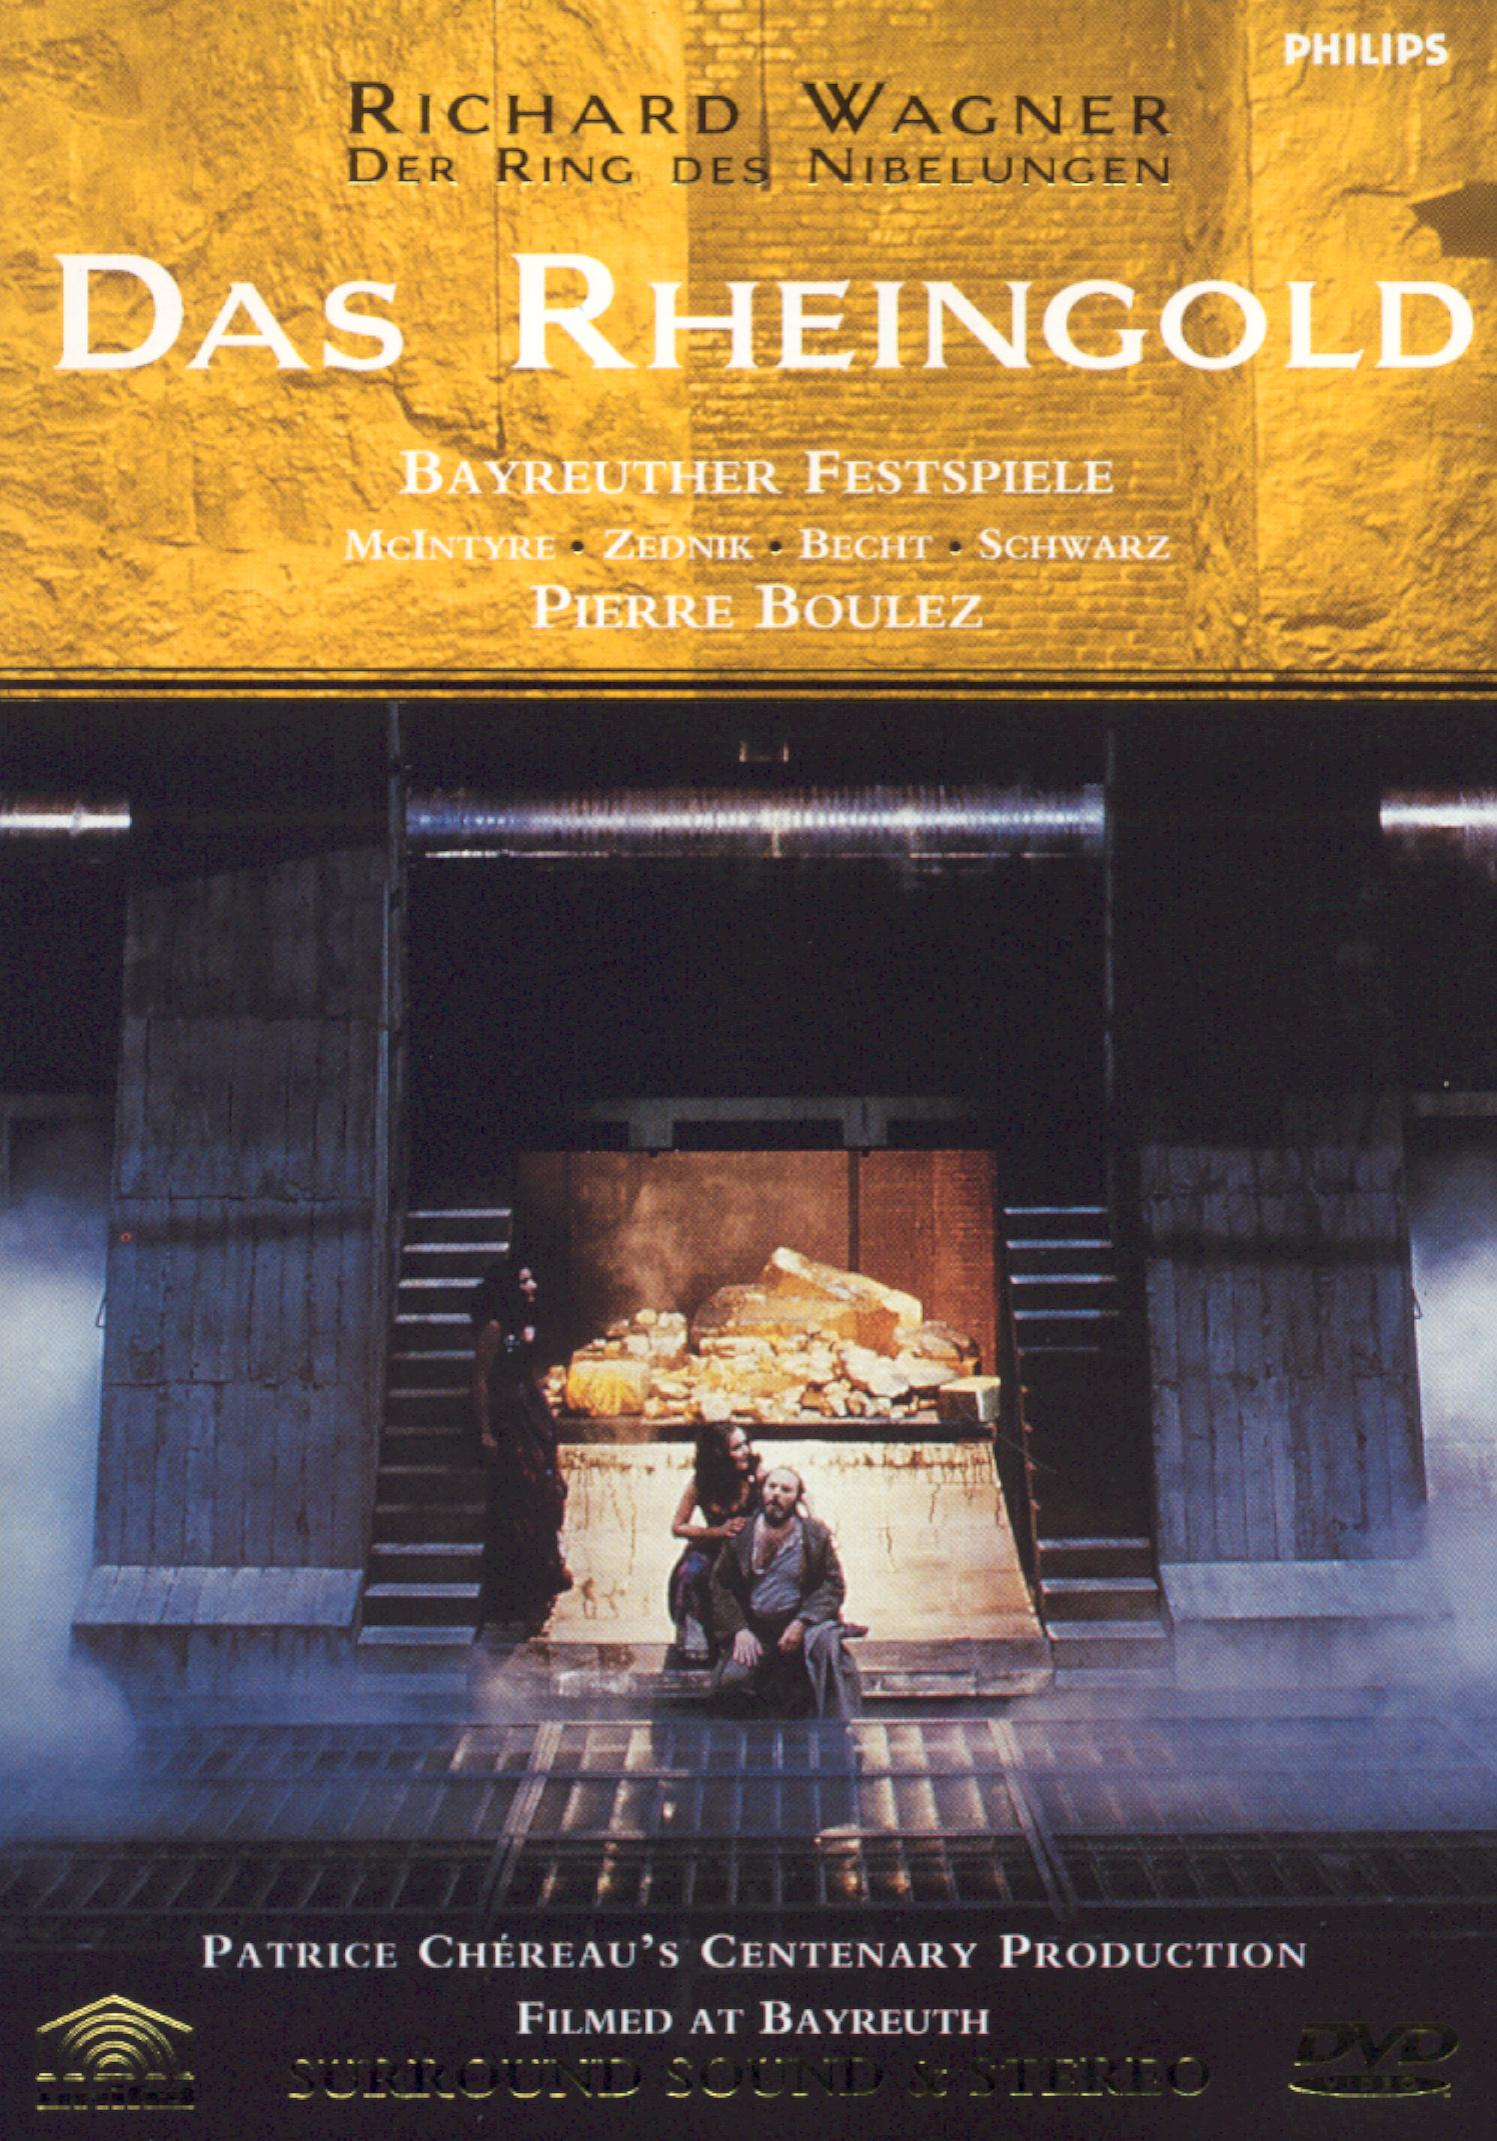 Das rheingold bayreuther festspiele boulez 1976 for Butlers bayreuth